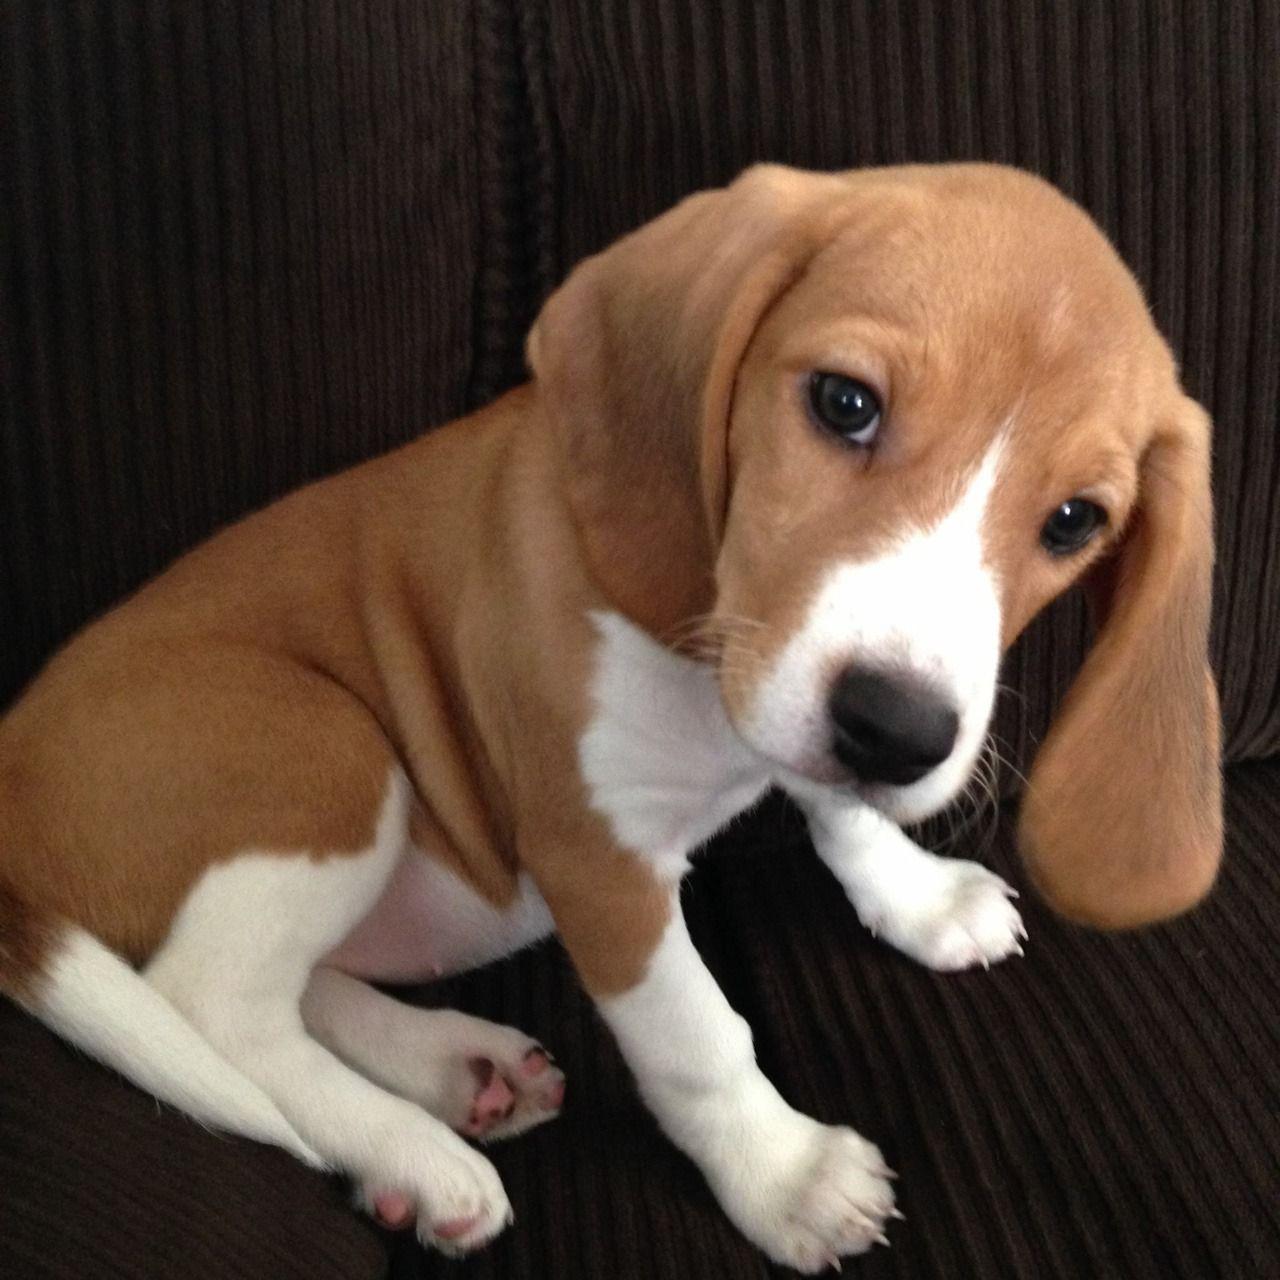 Beagle Pup Beagle Puppy Beagle Dog White Beagle